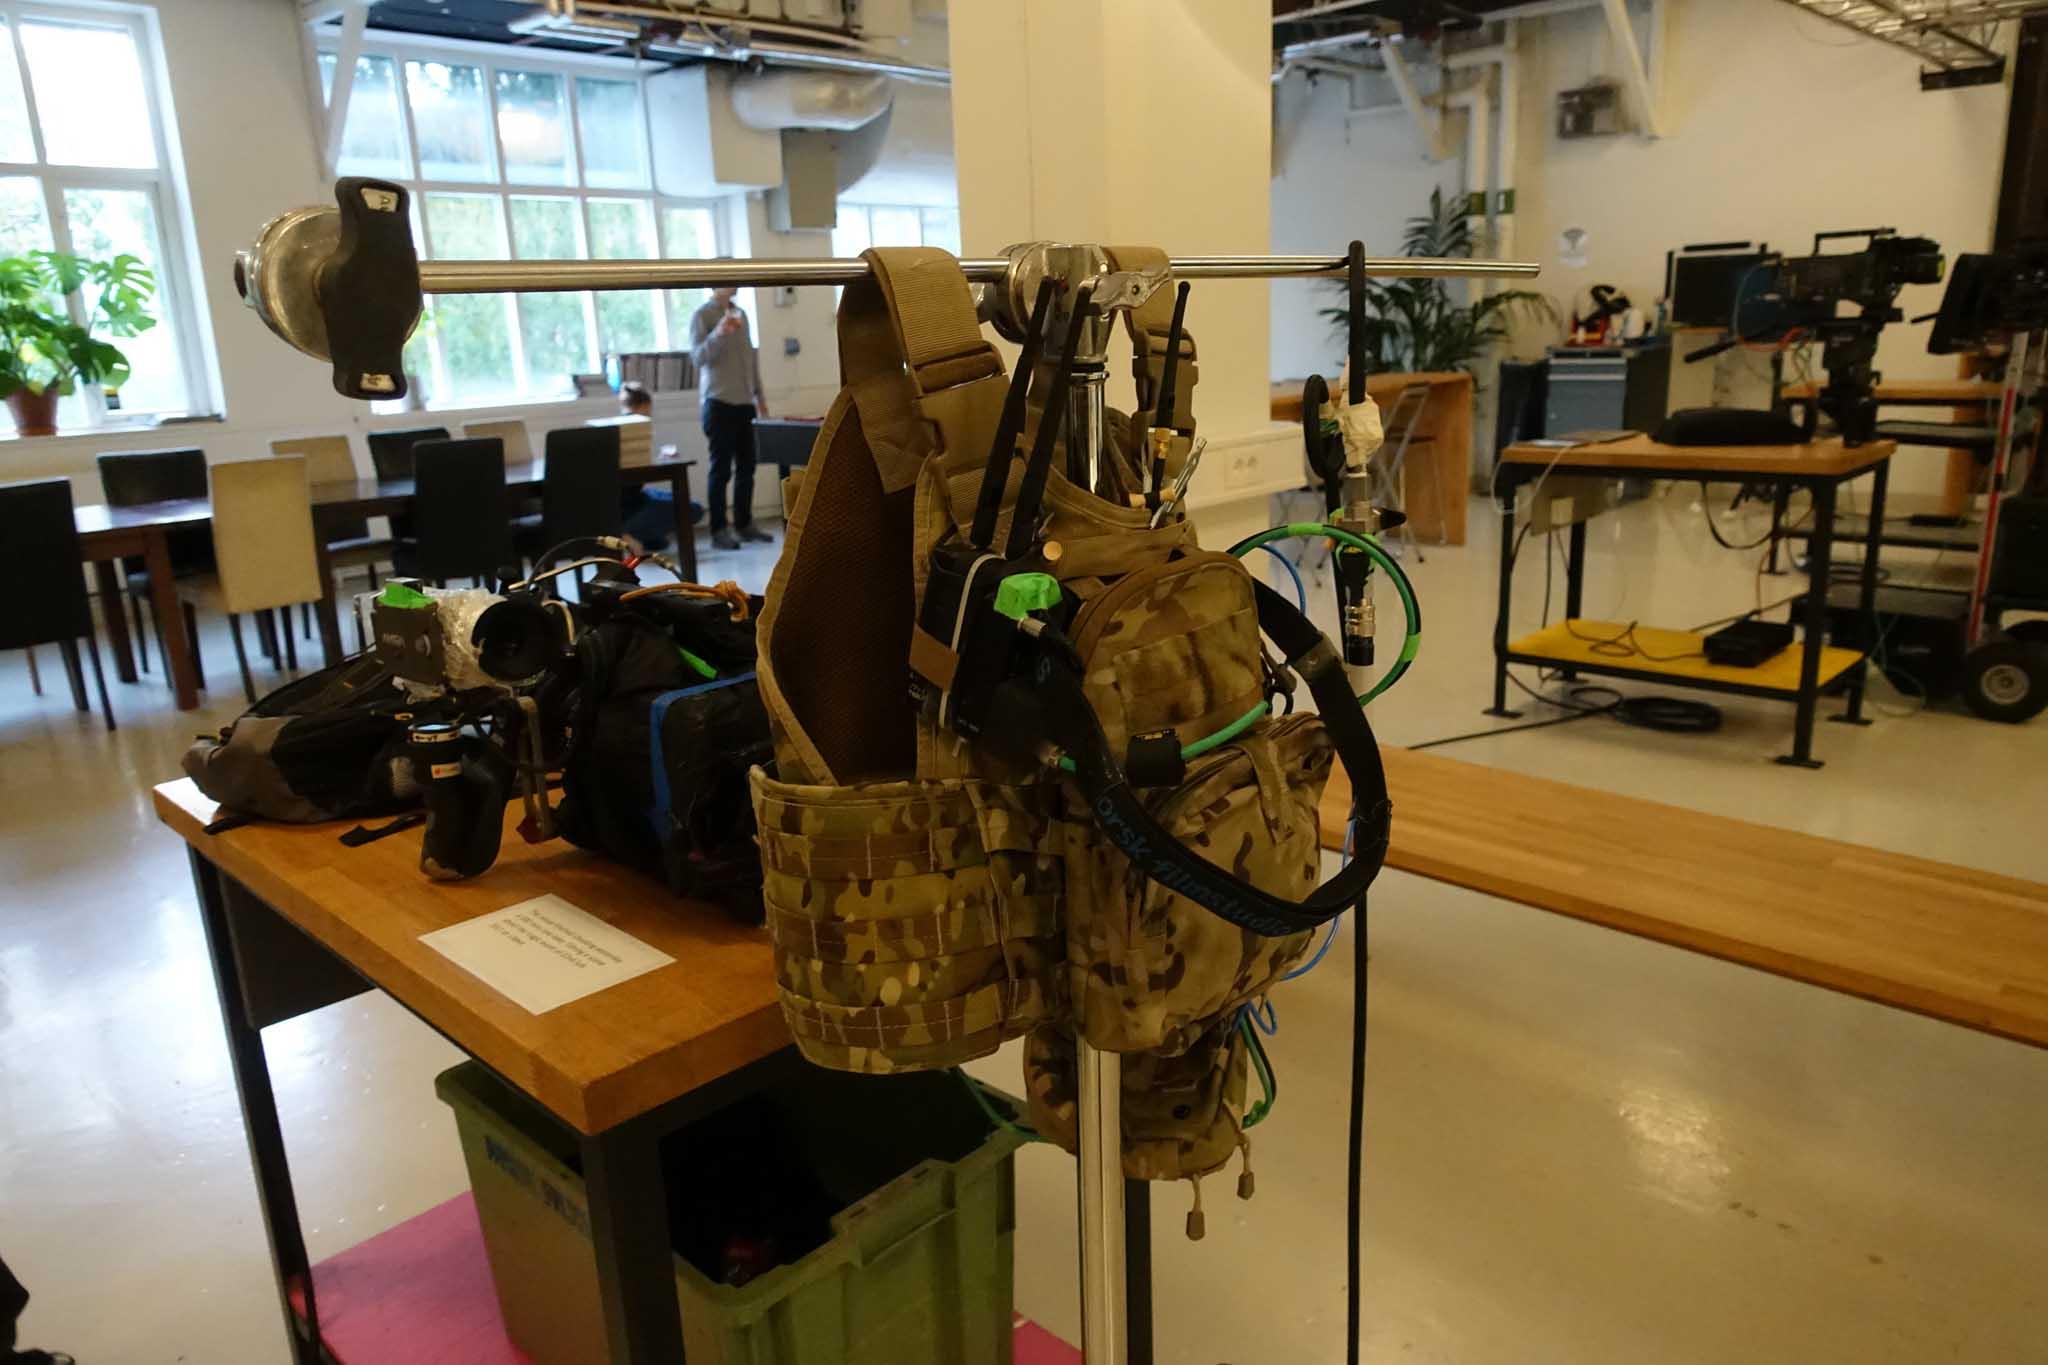 Operator's custom vest with batteries, Teradek Bolt 3000 transmitter, air cannister for lens nozzles.